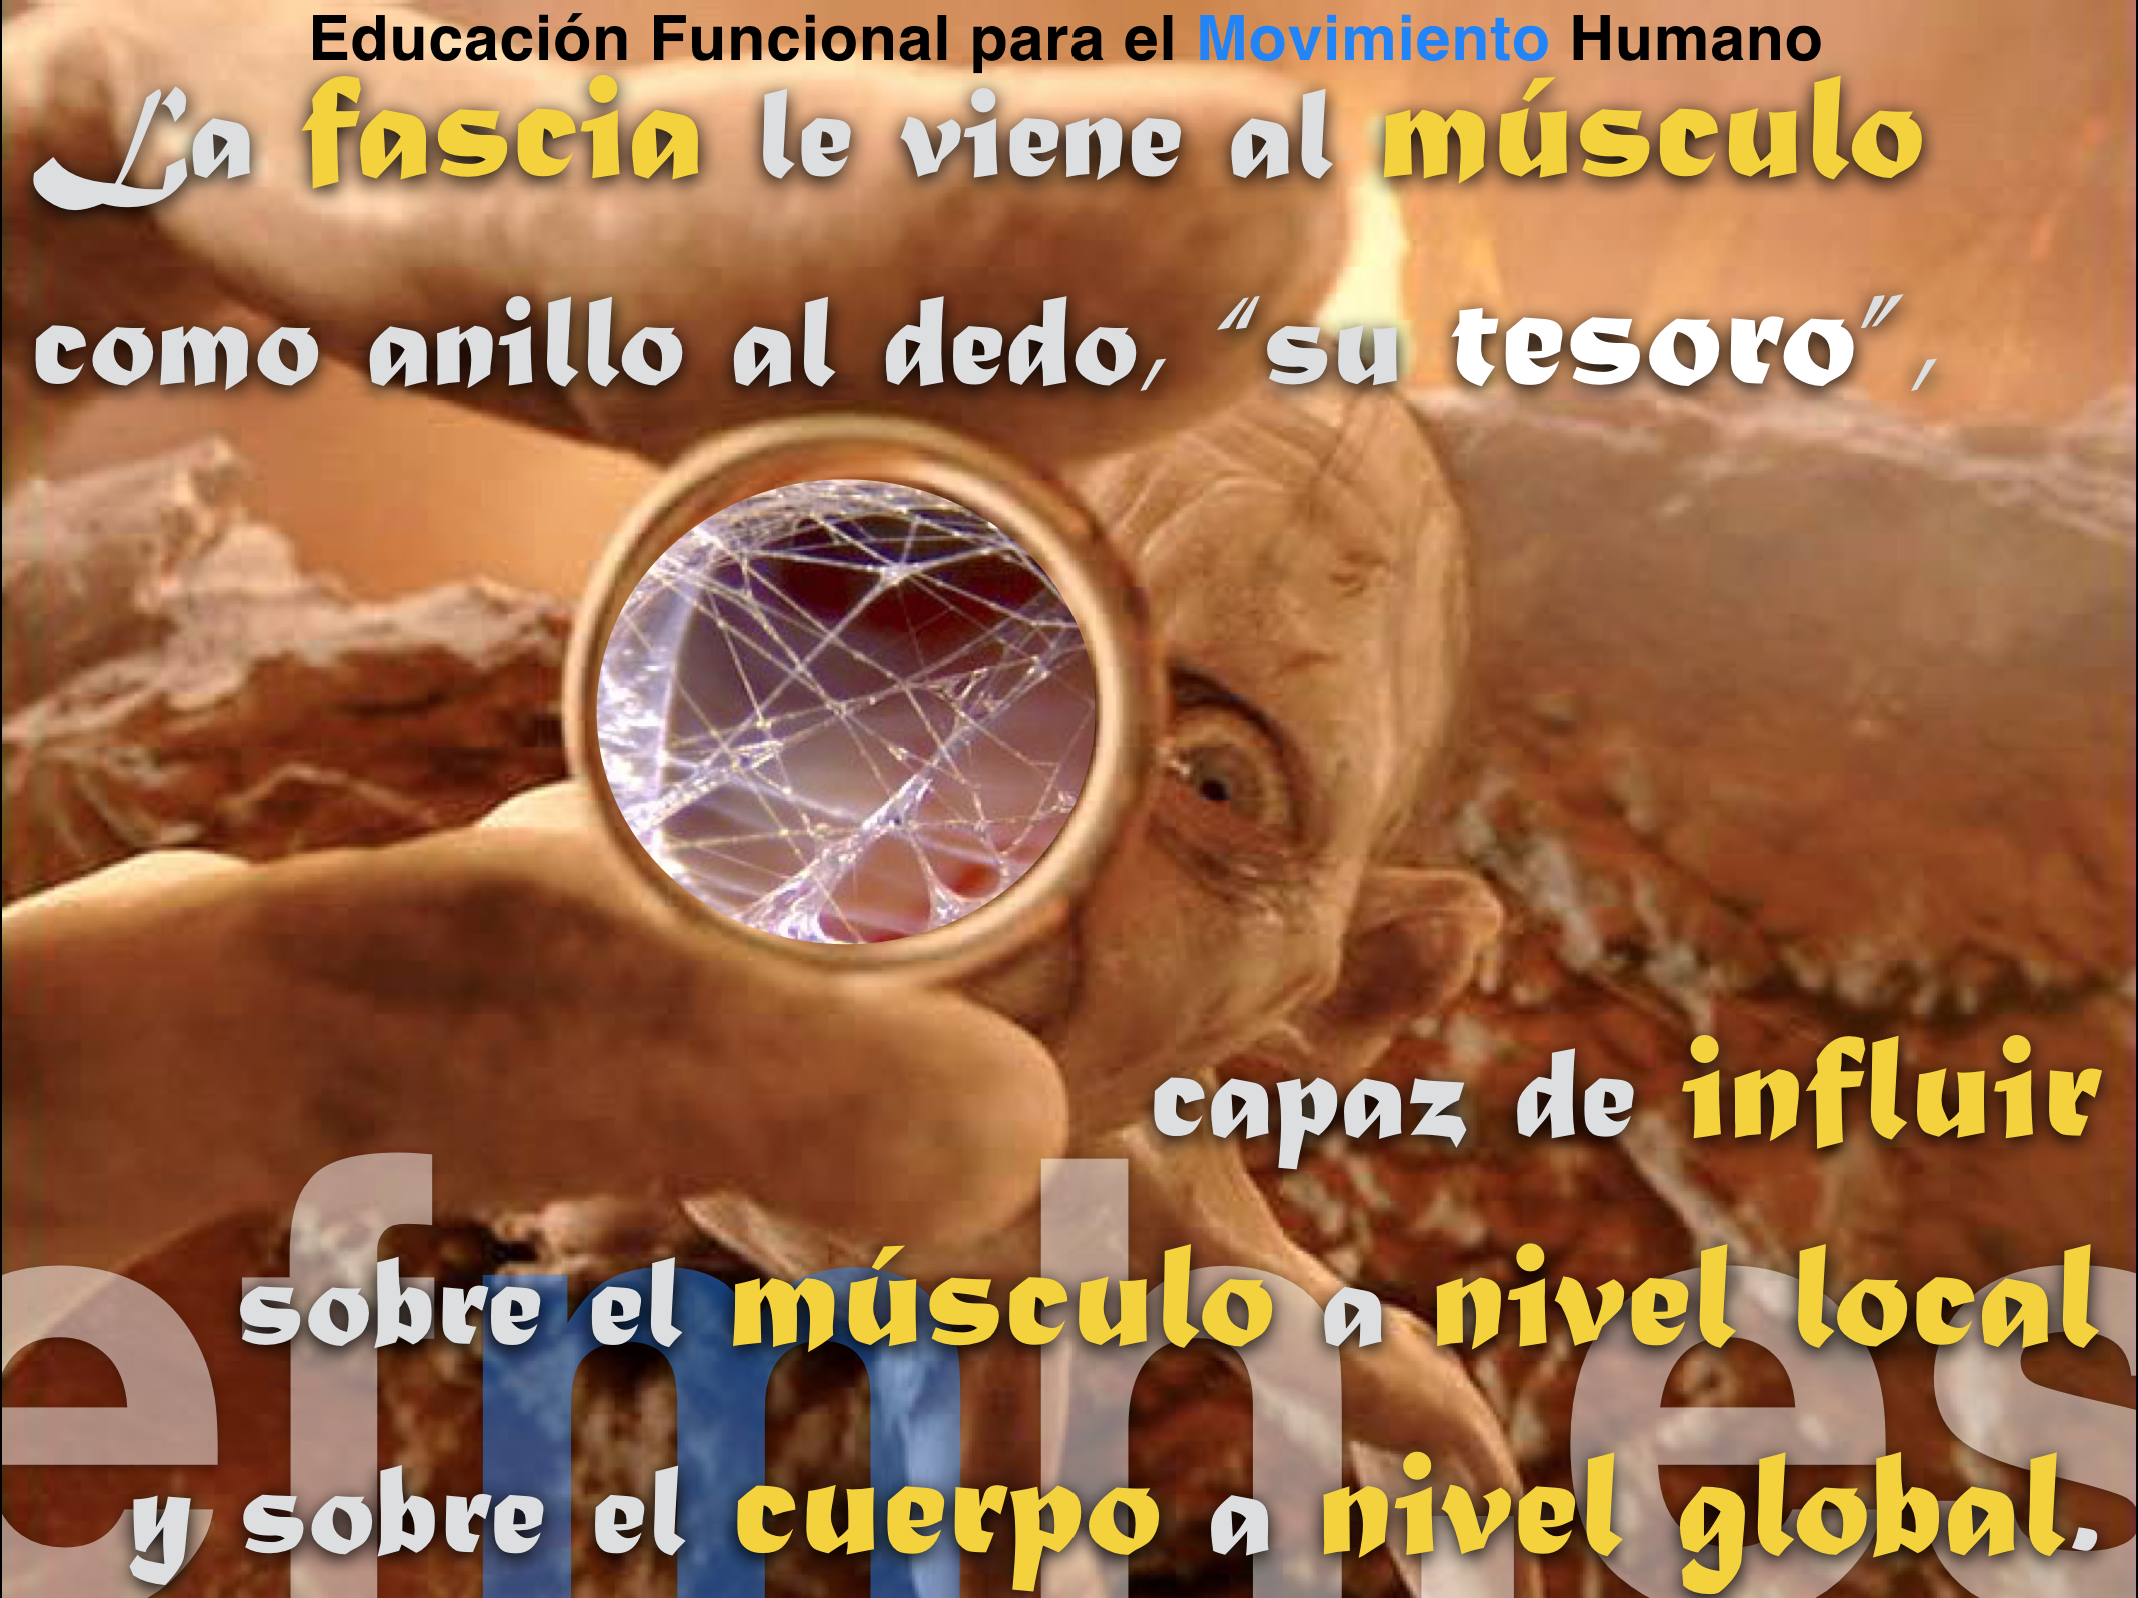 fascia musculo miofascia tesoro